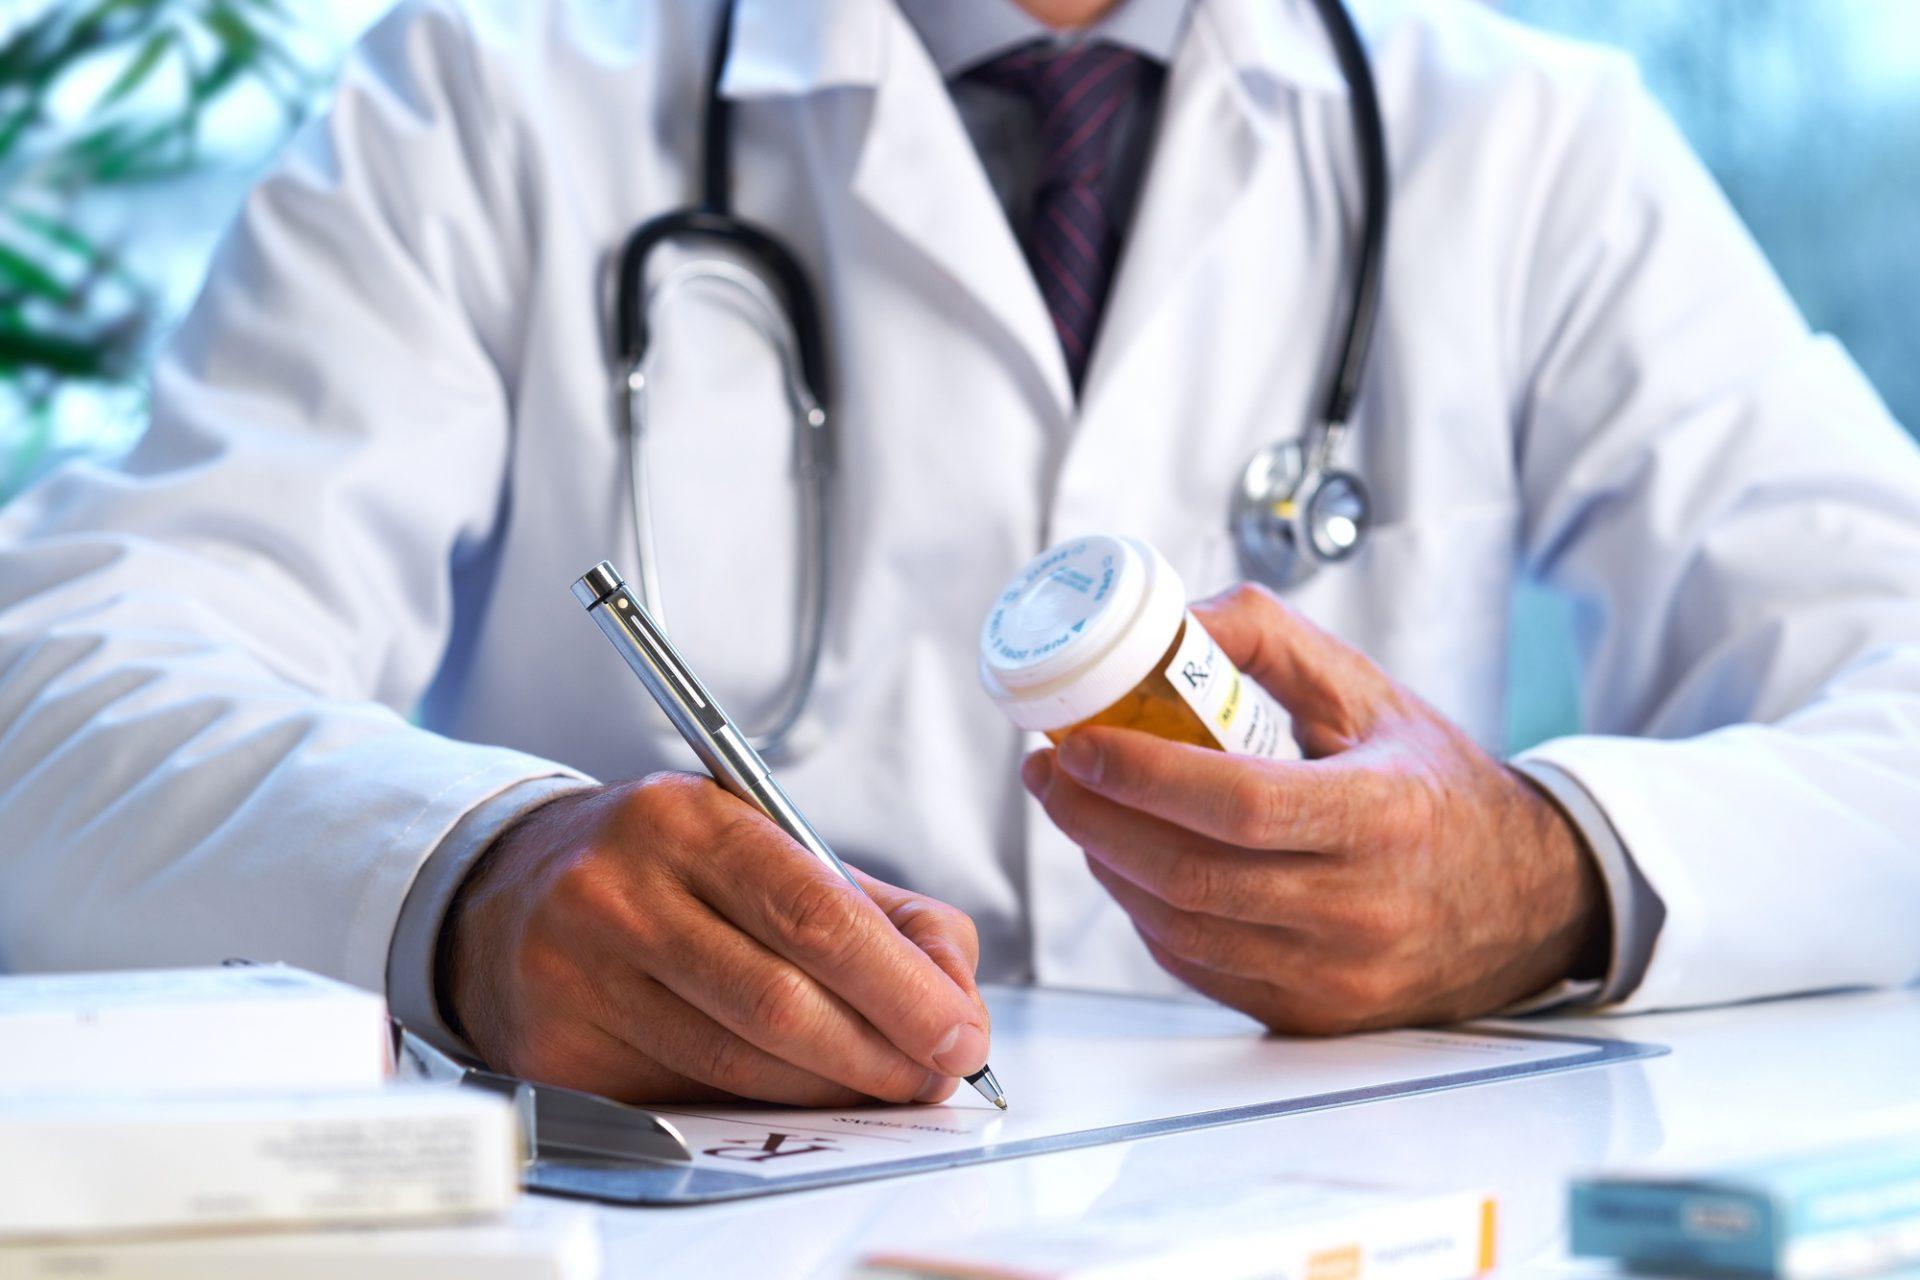 Medicamentos alopáticos: Como funciona o medicamento alopático?